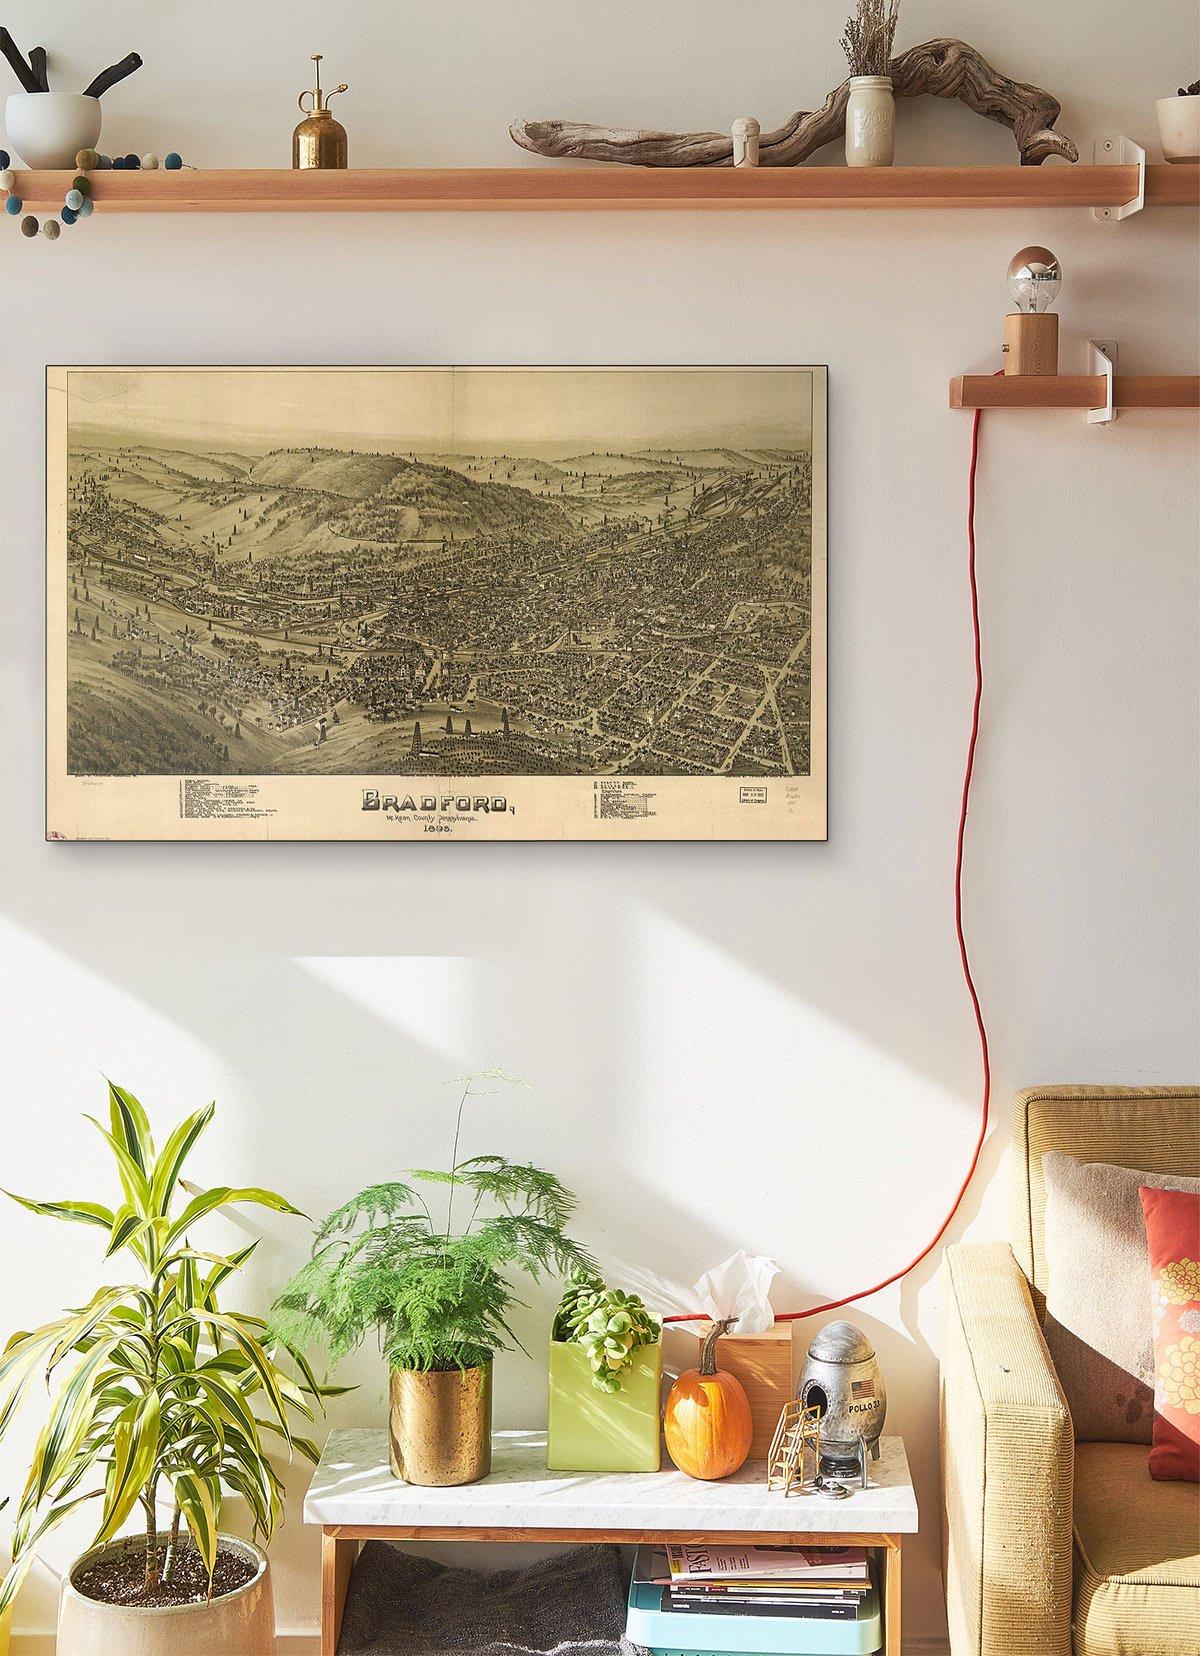 Bradford Mckean County Pennsylvania 1895 LARGE Vintage Map